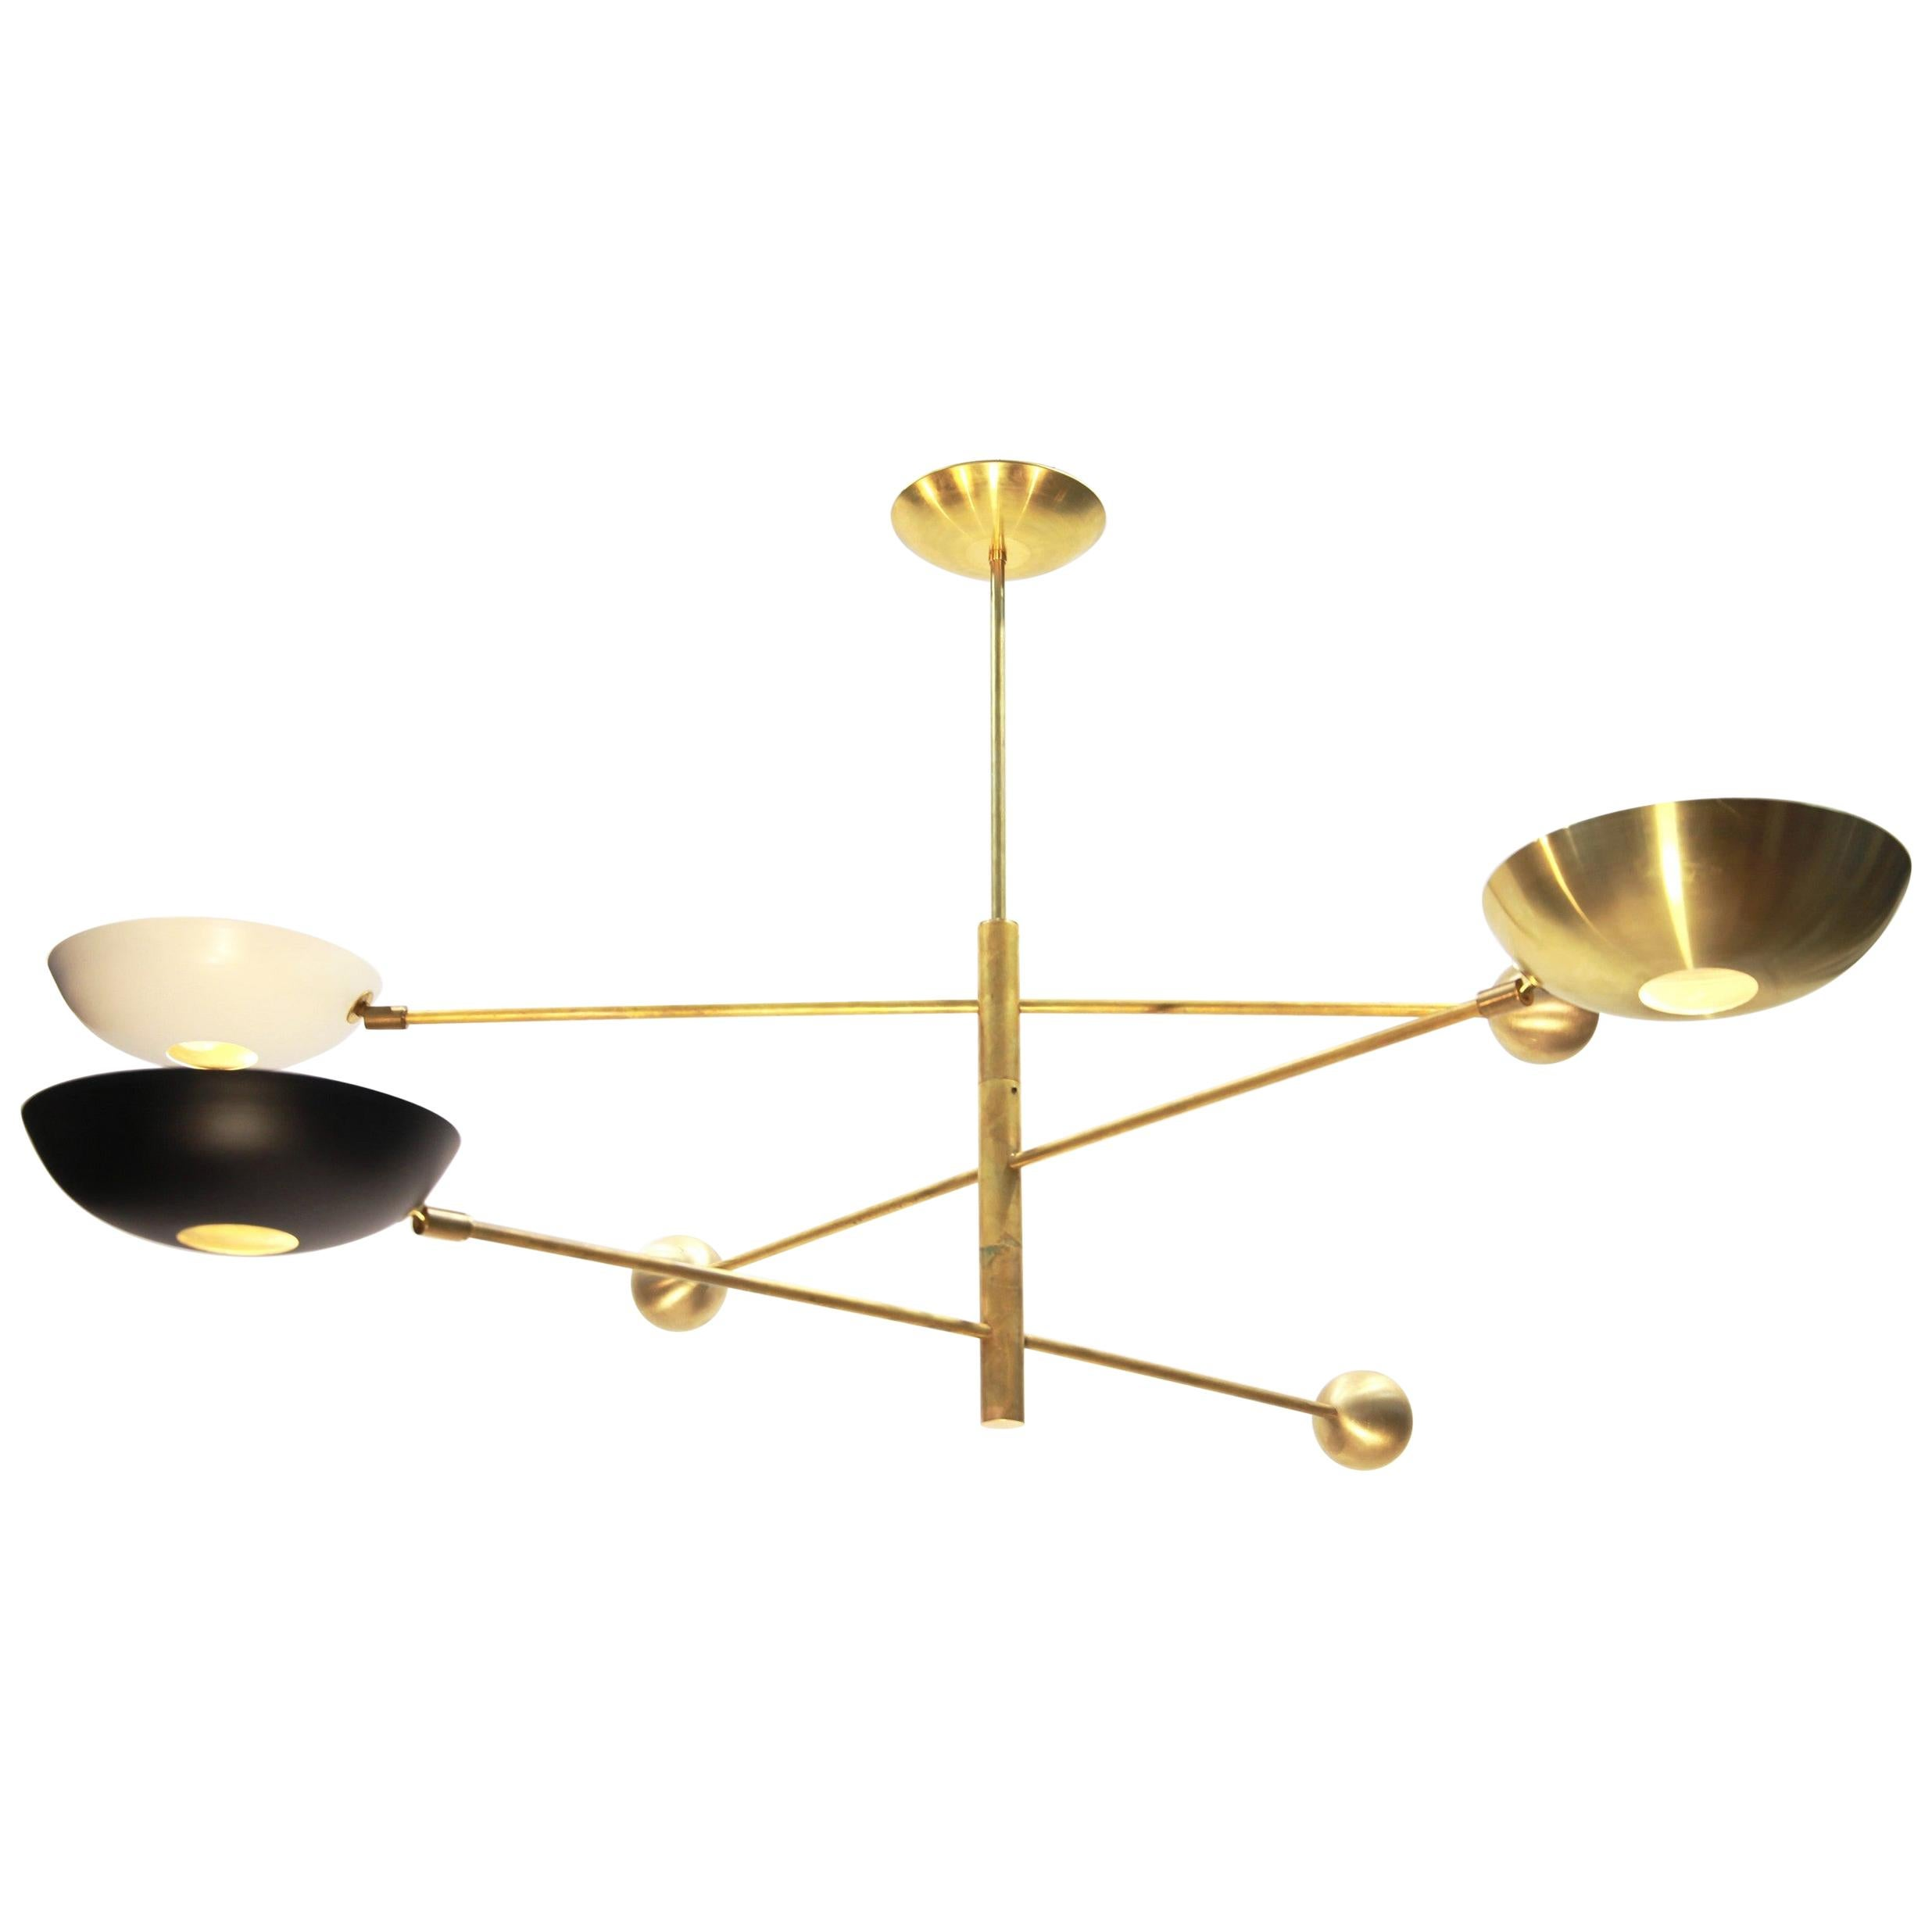 Orbitale Brass Chandelier 3 Rotating Balanced Arms, Stilnovo Style, Brass Shades